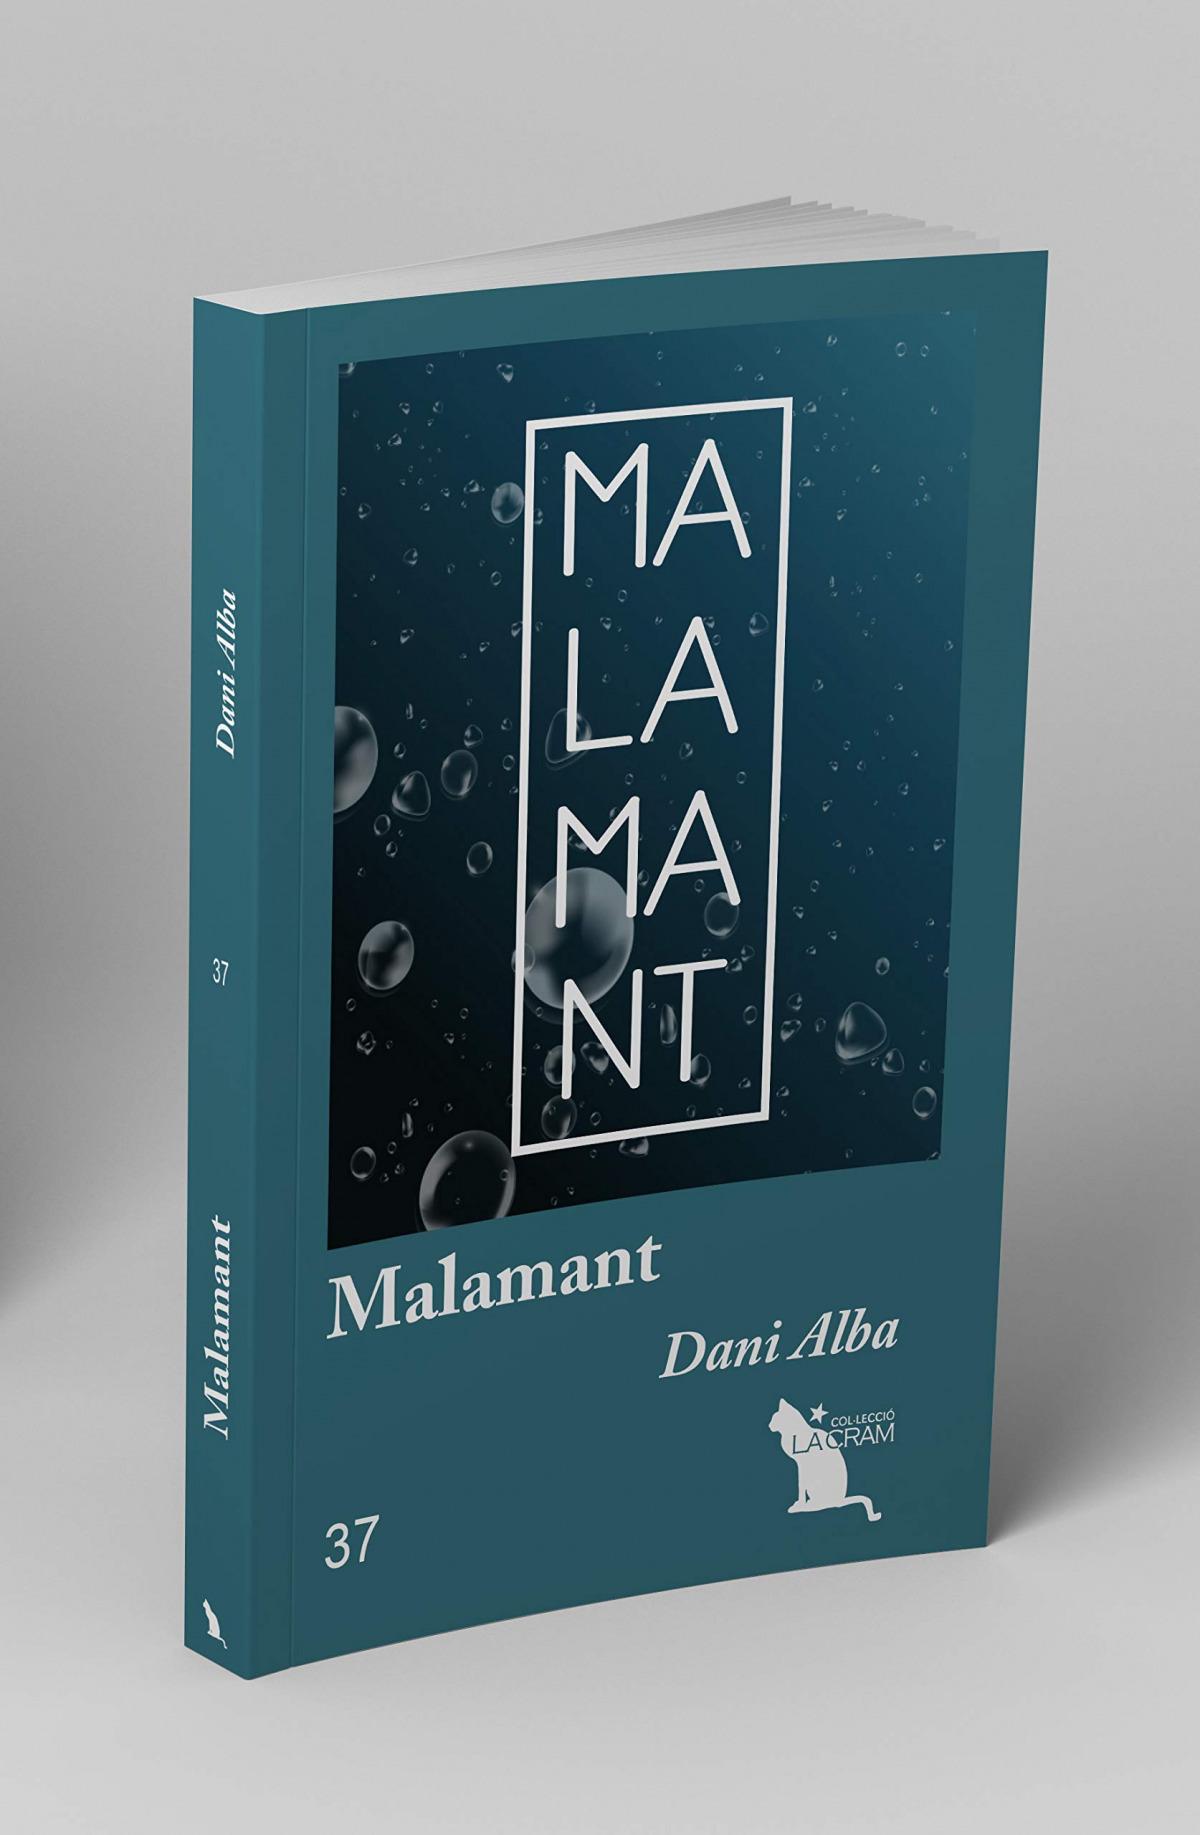 Malamant